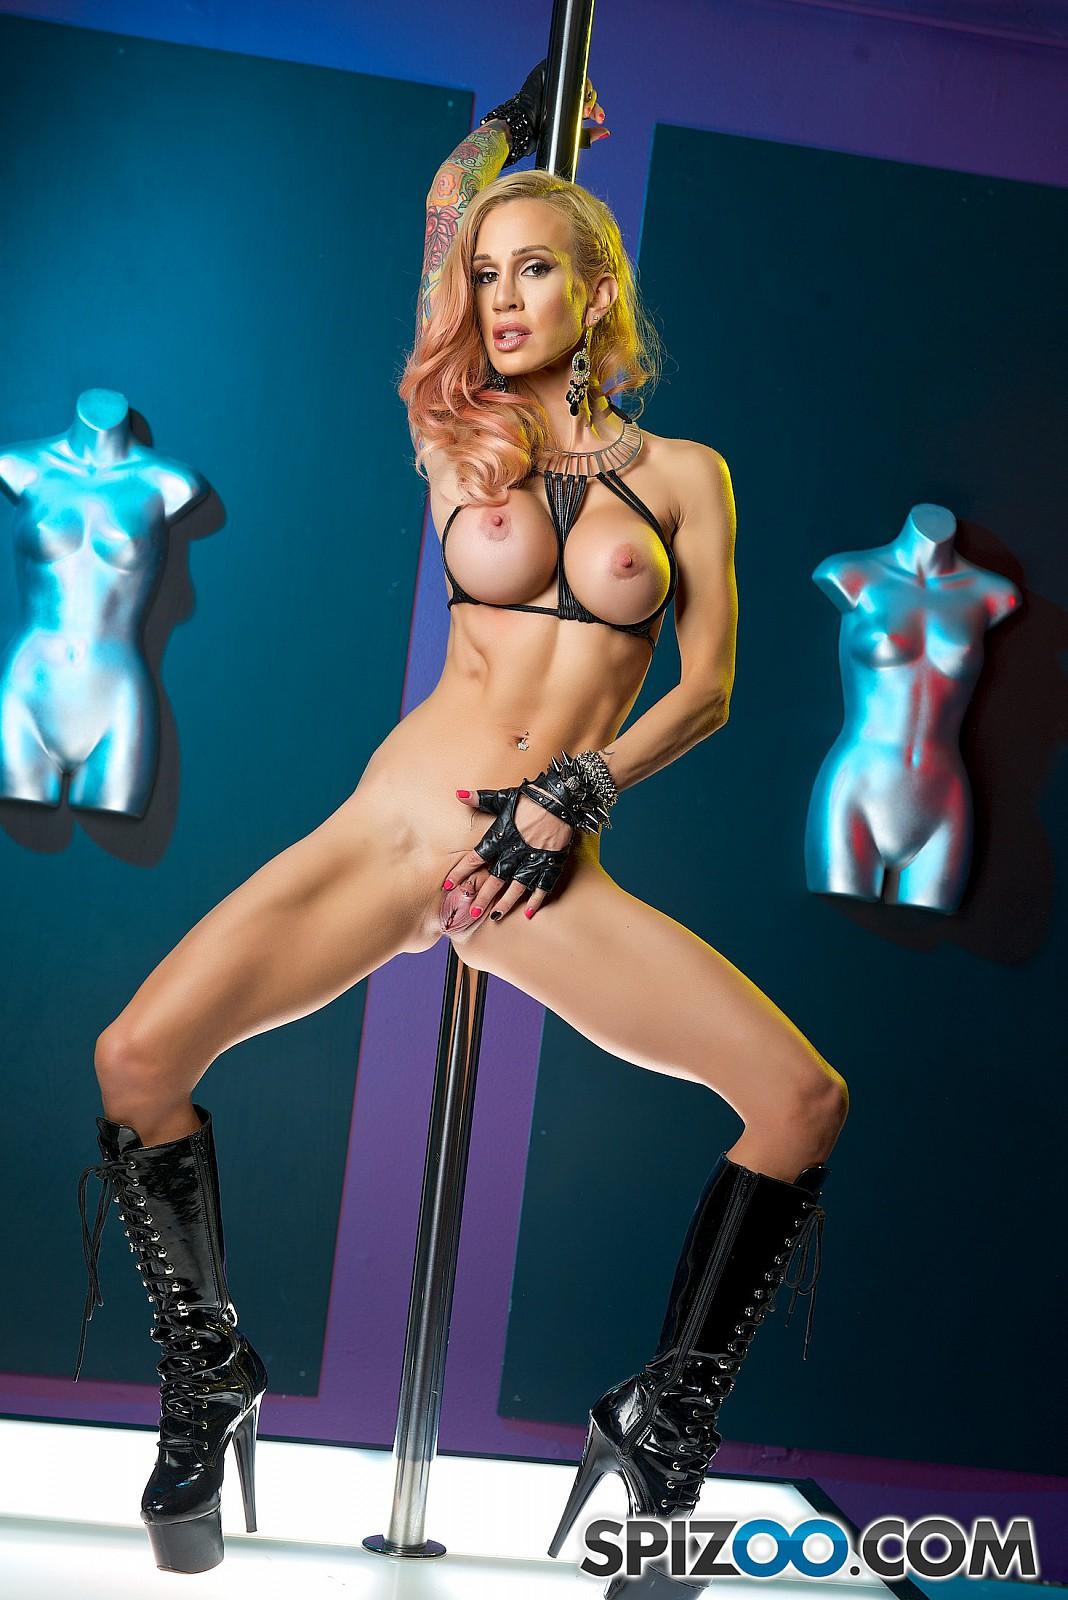 Sarah Fit Stripper - famous Sarah Jessie - Spizoo 98479